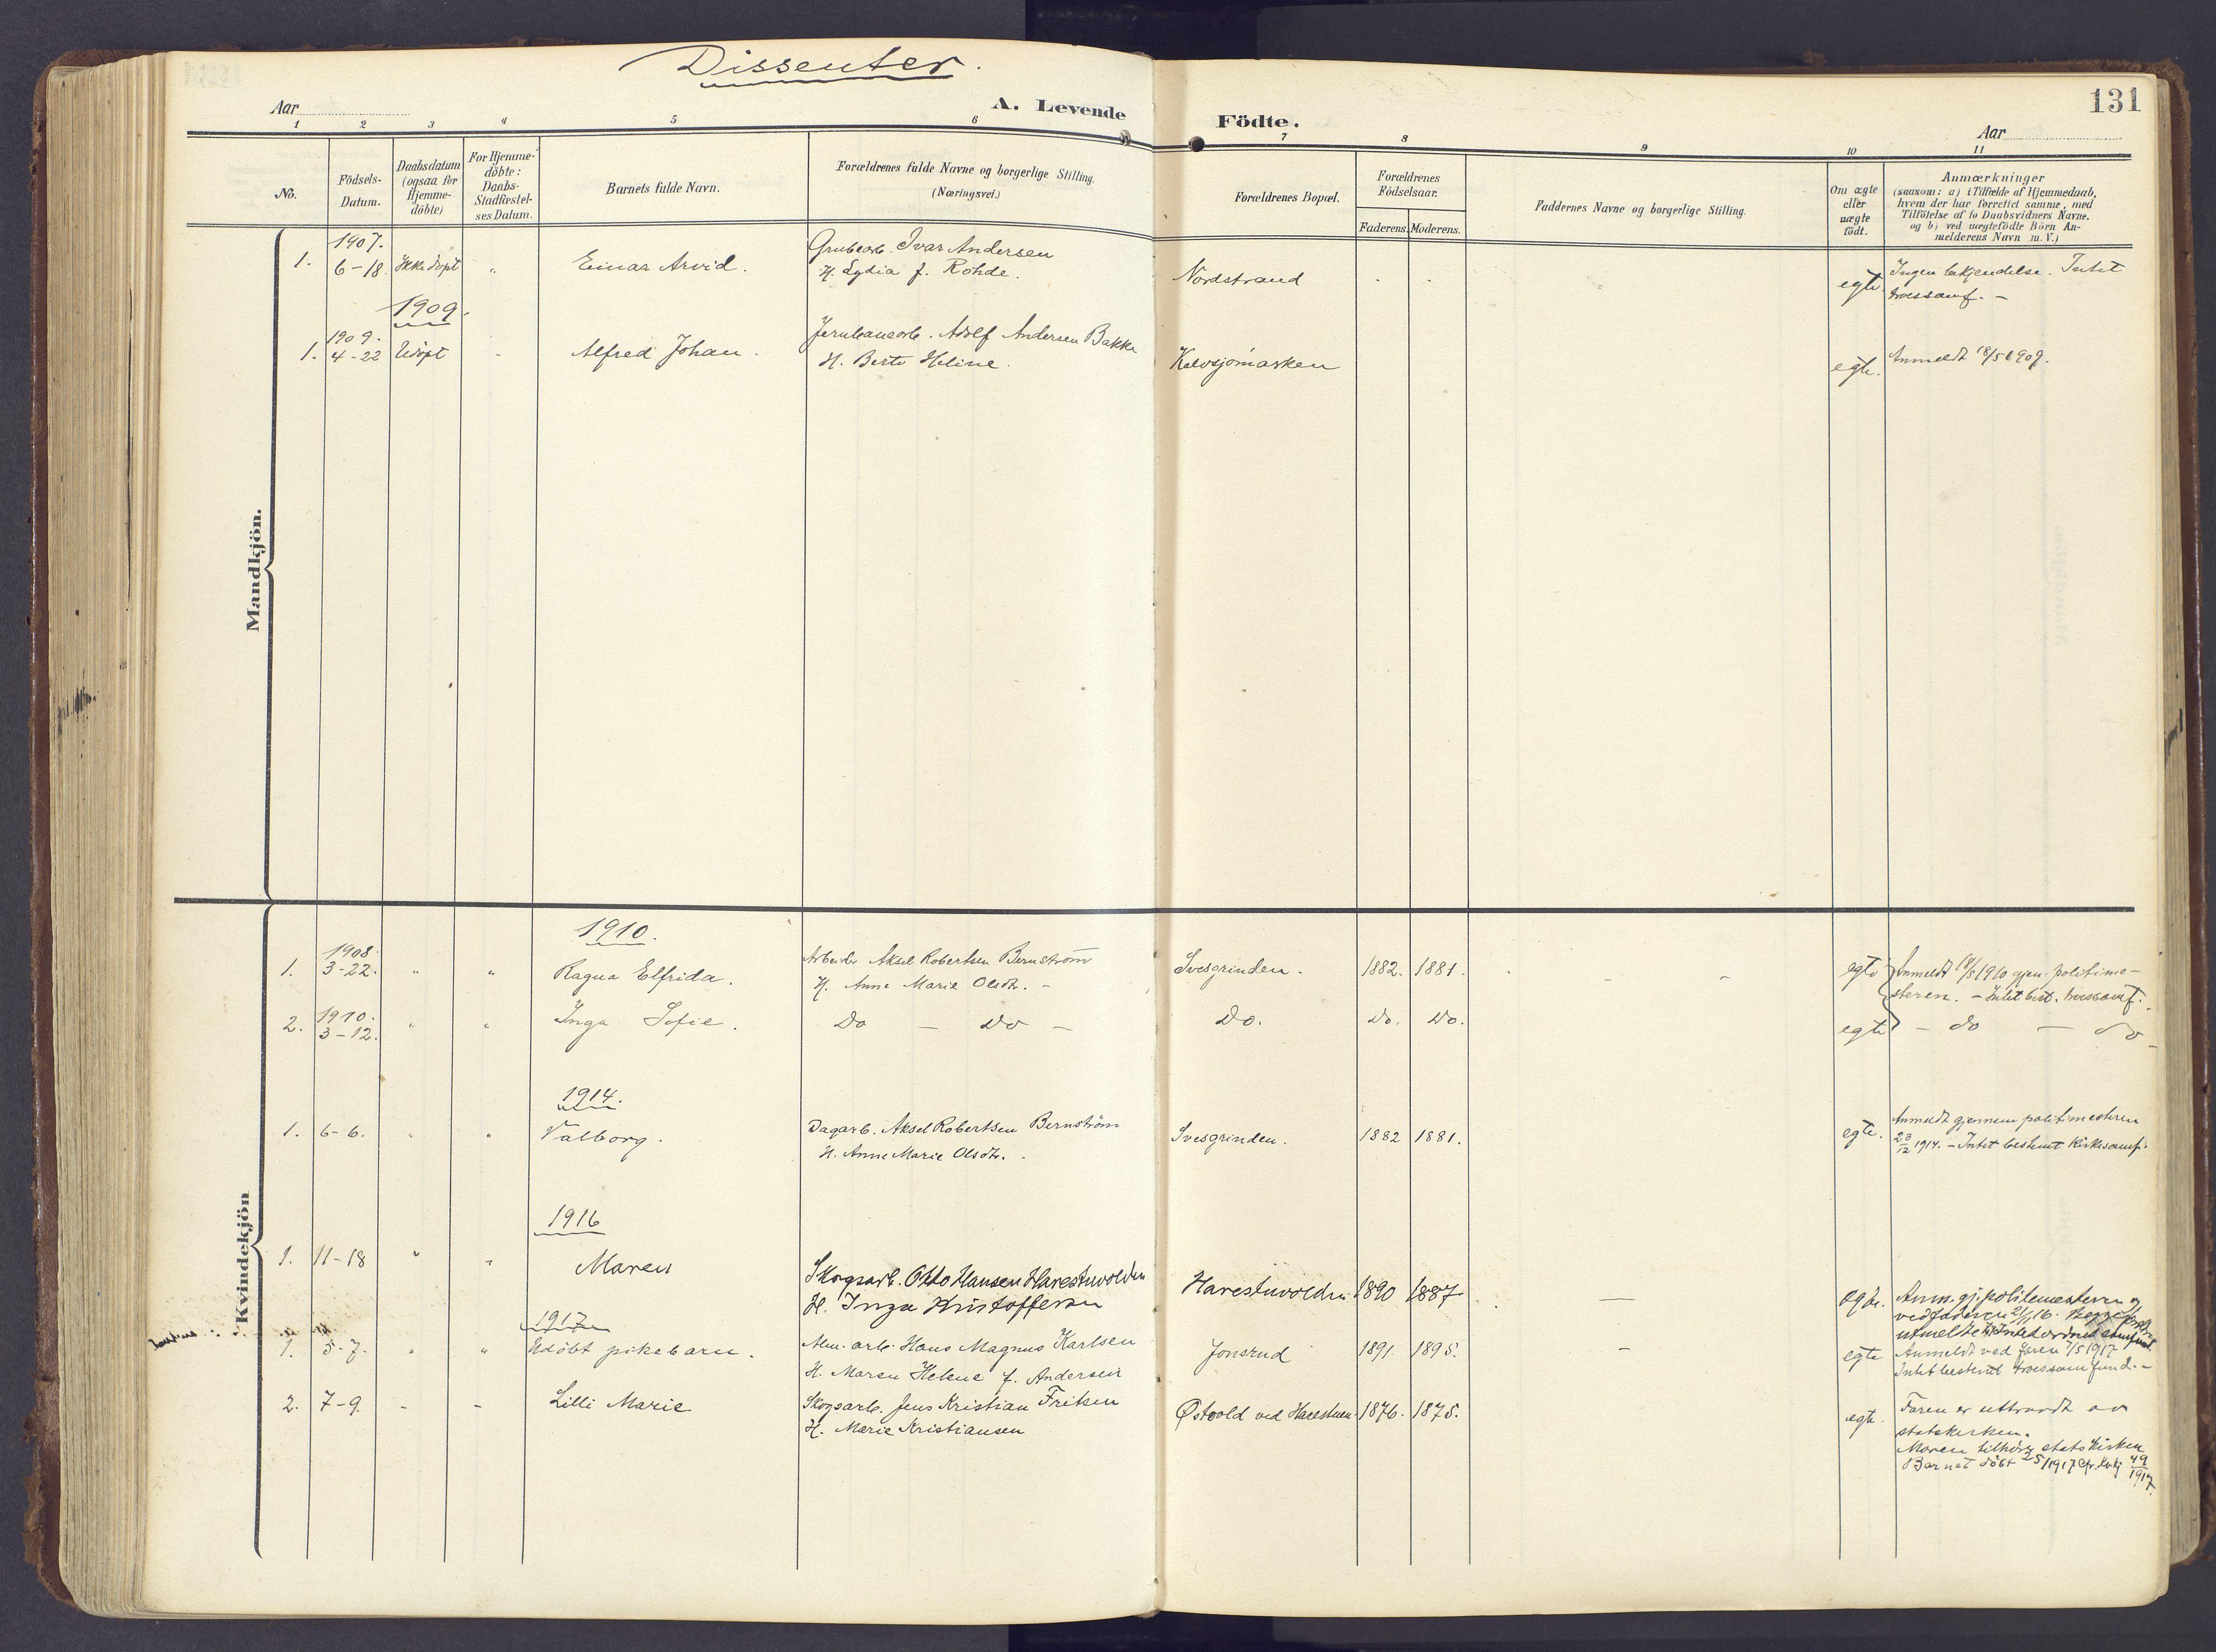 SAH, Lunner prestekontor, H/Ha/Haa/L0001: Ministerialbok nr. 1, 1907-1922, s. 131